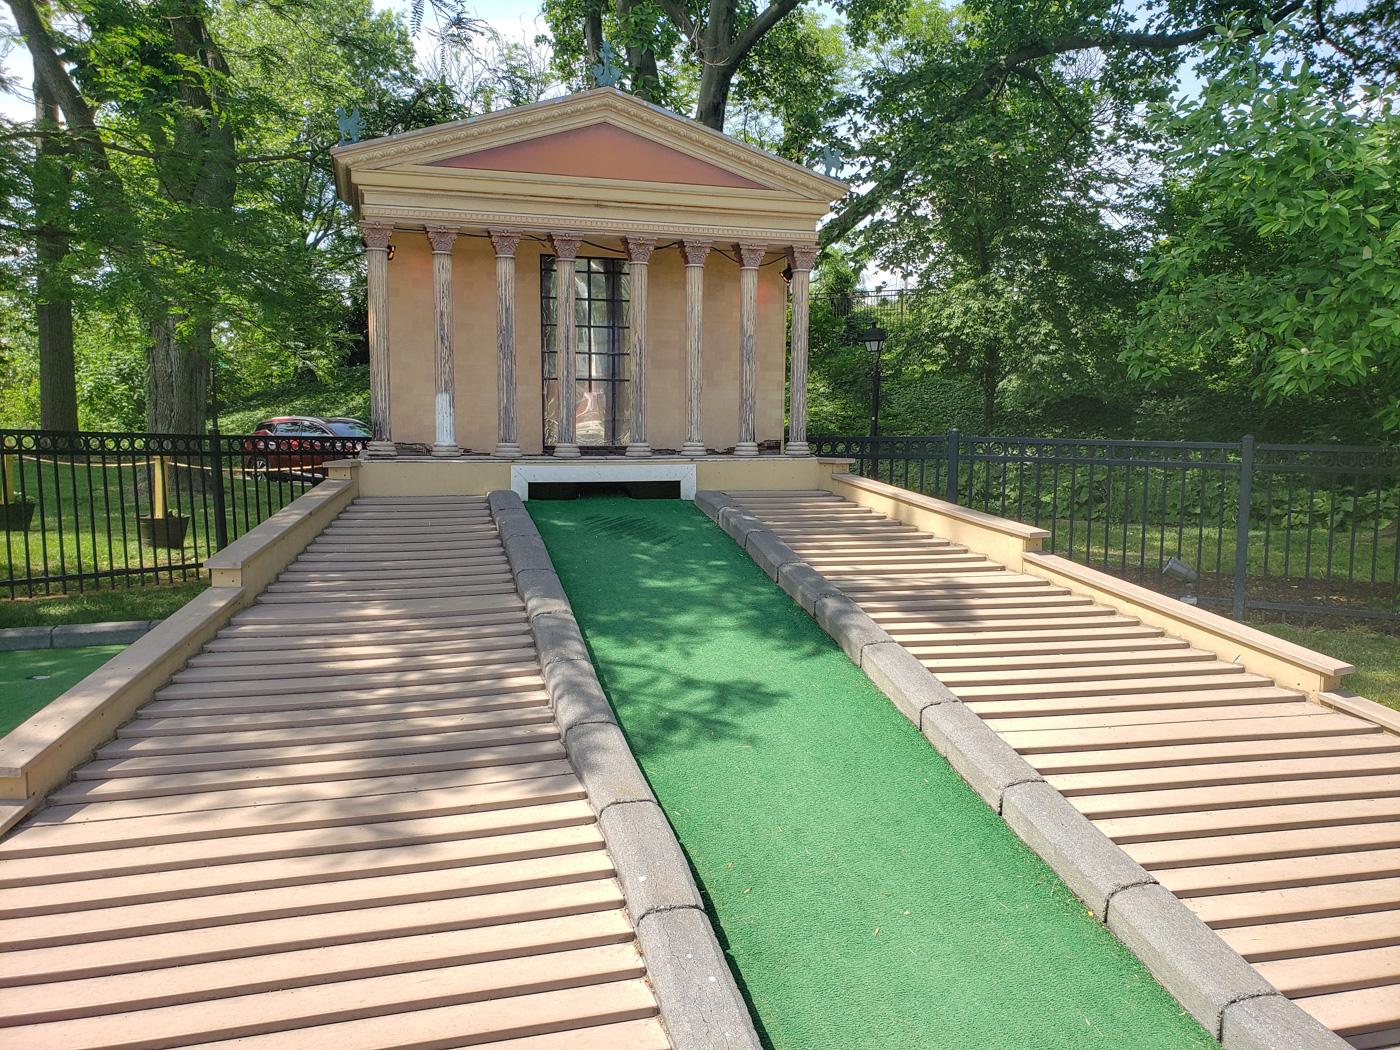 Philadelphia Museum of Art at Franklin Square Mini-Golf